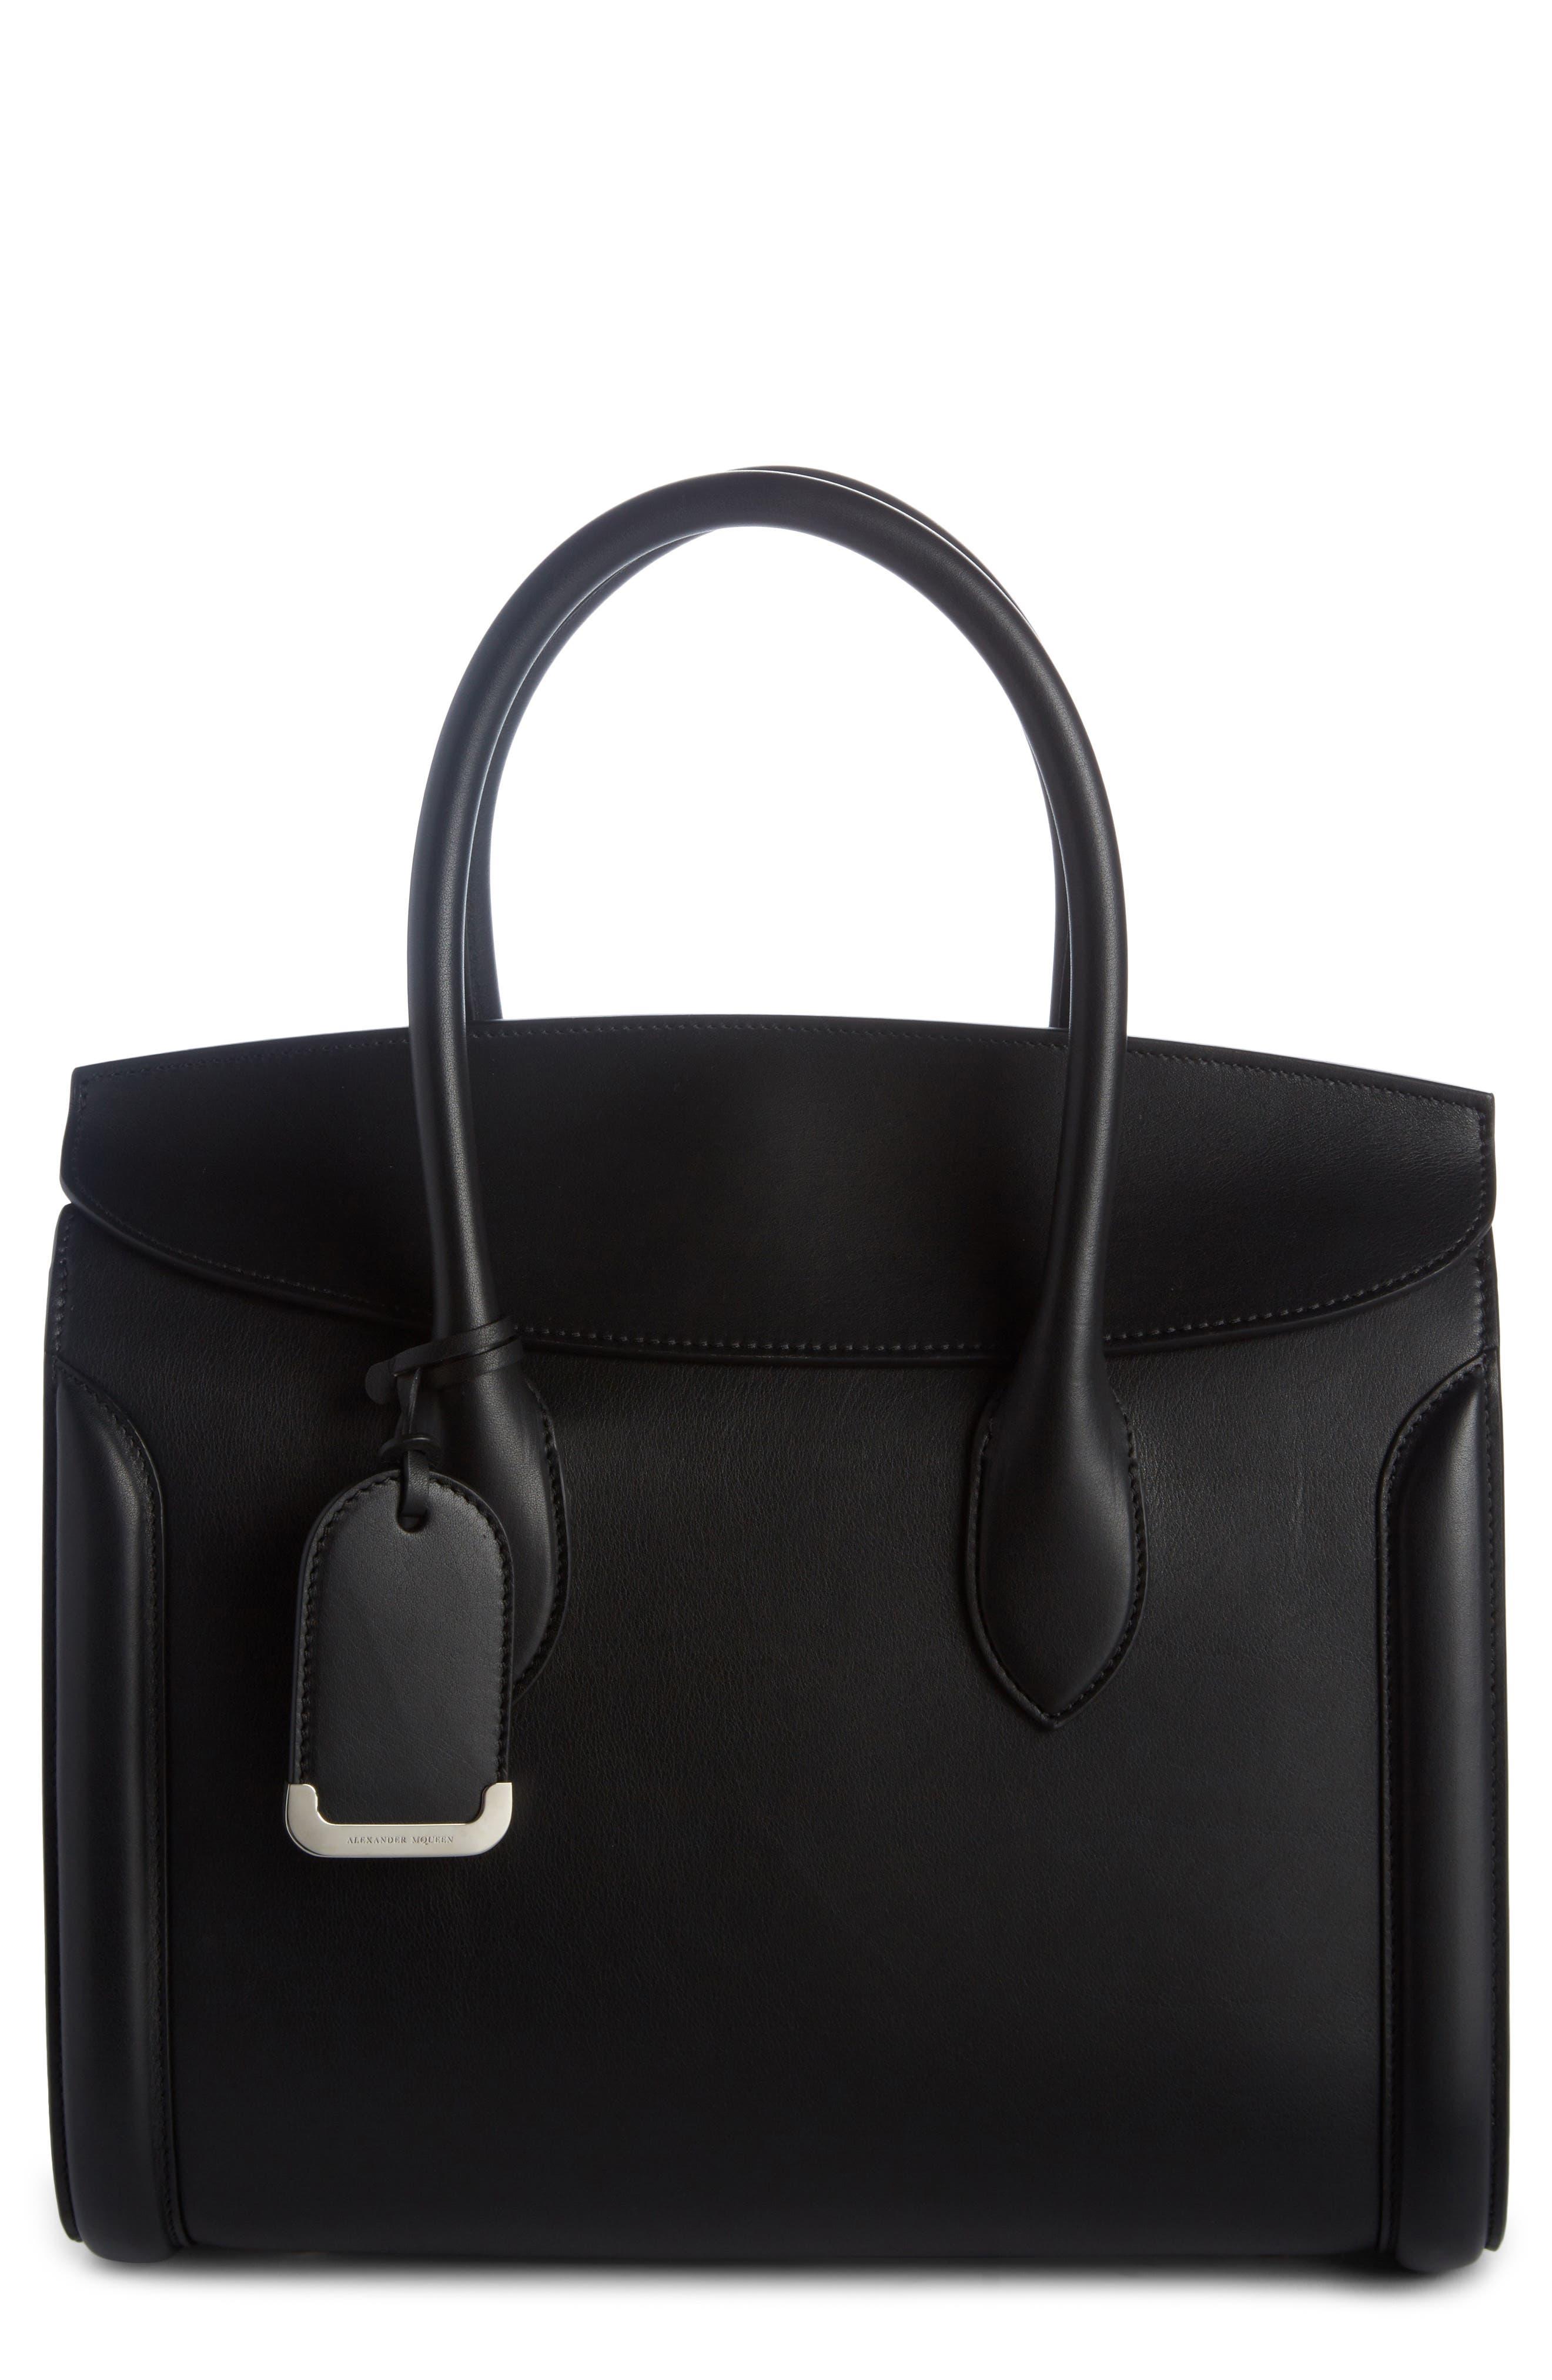 Heroine 30 Sweet Calfskin Leather Shopper,                         Main,                         color, Black